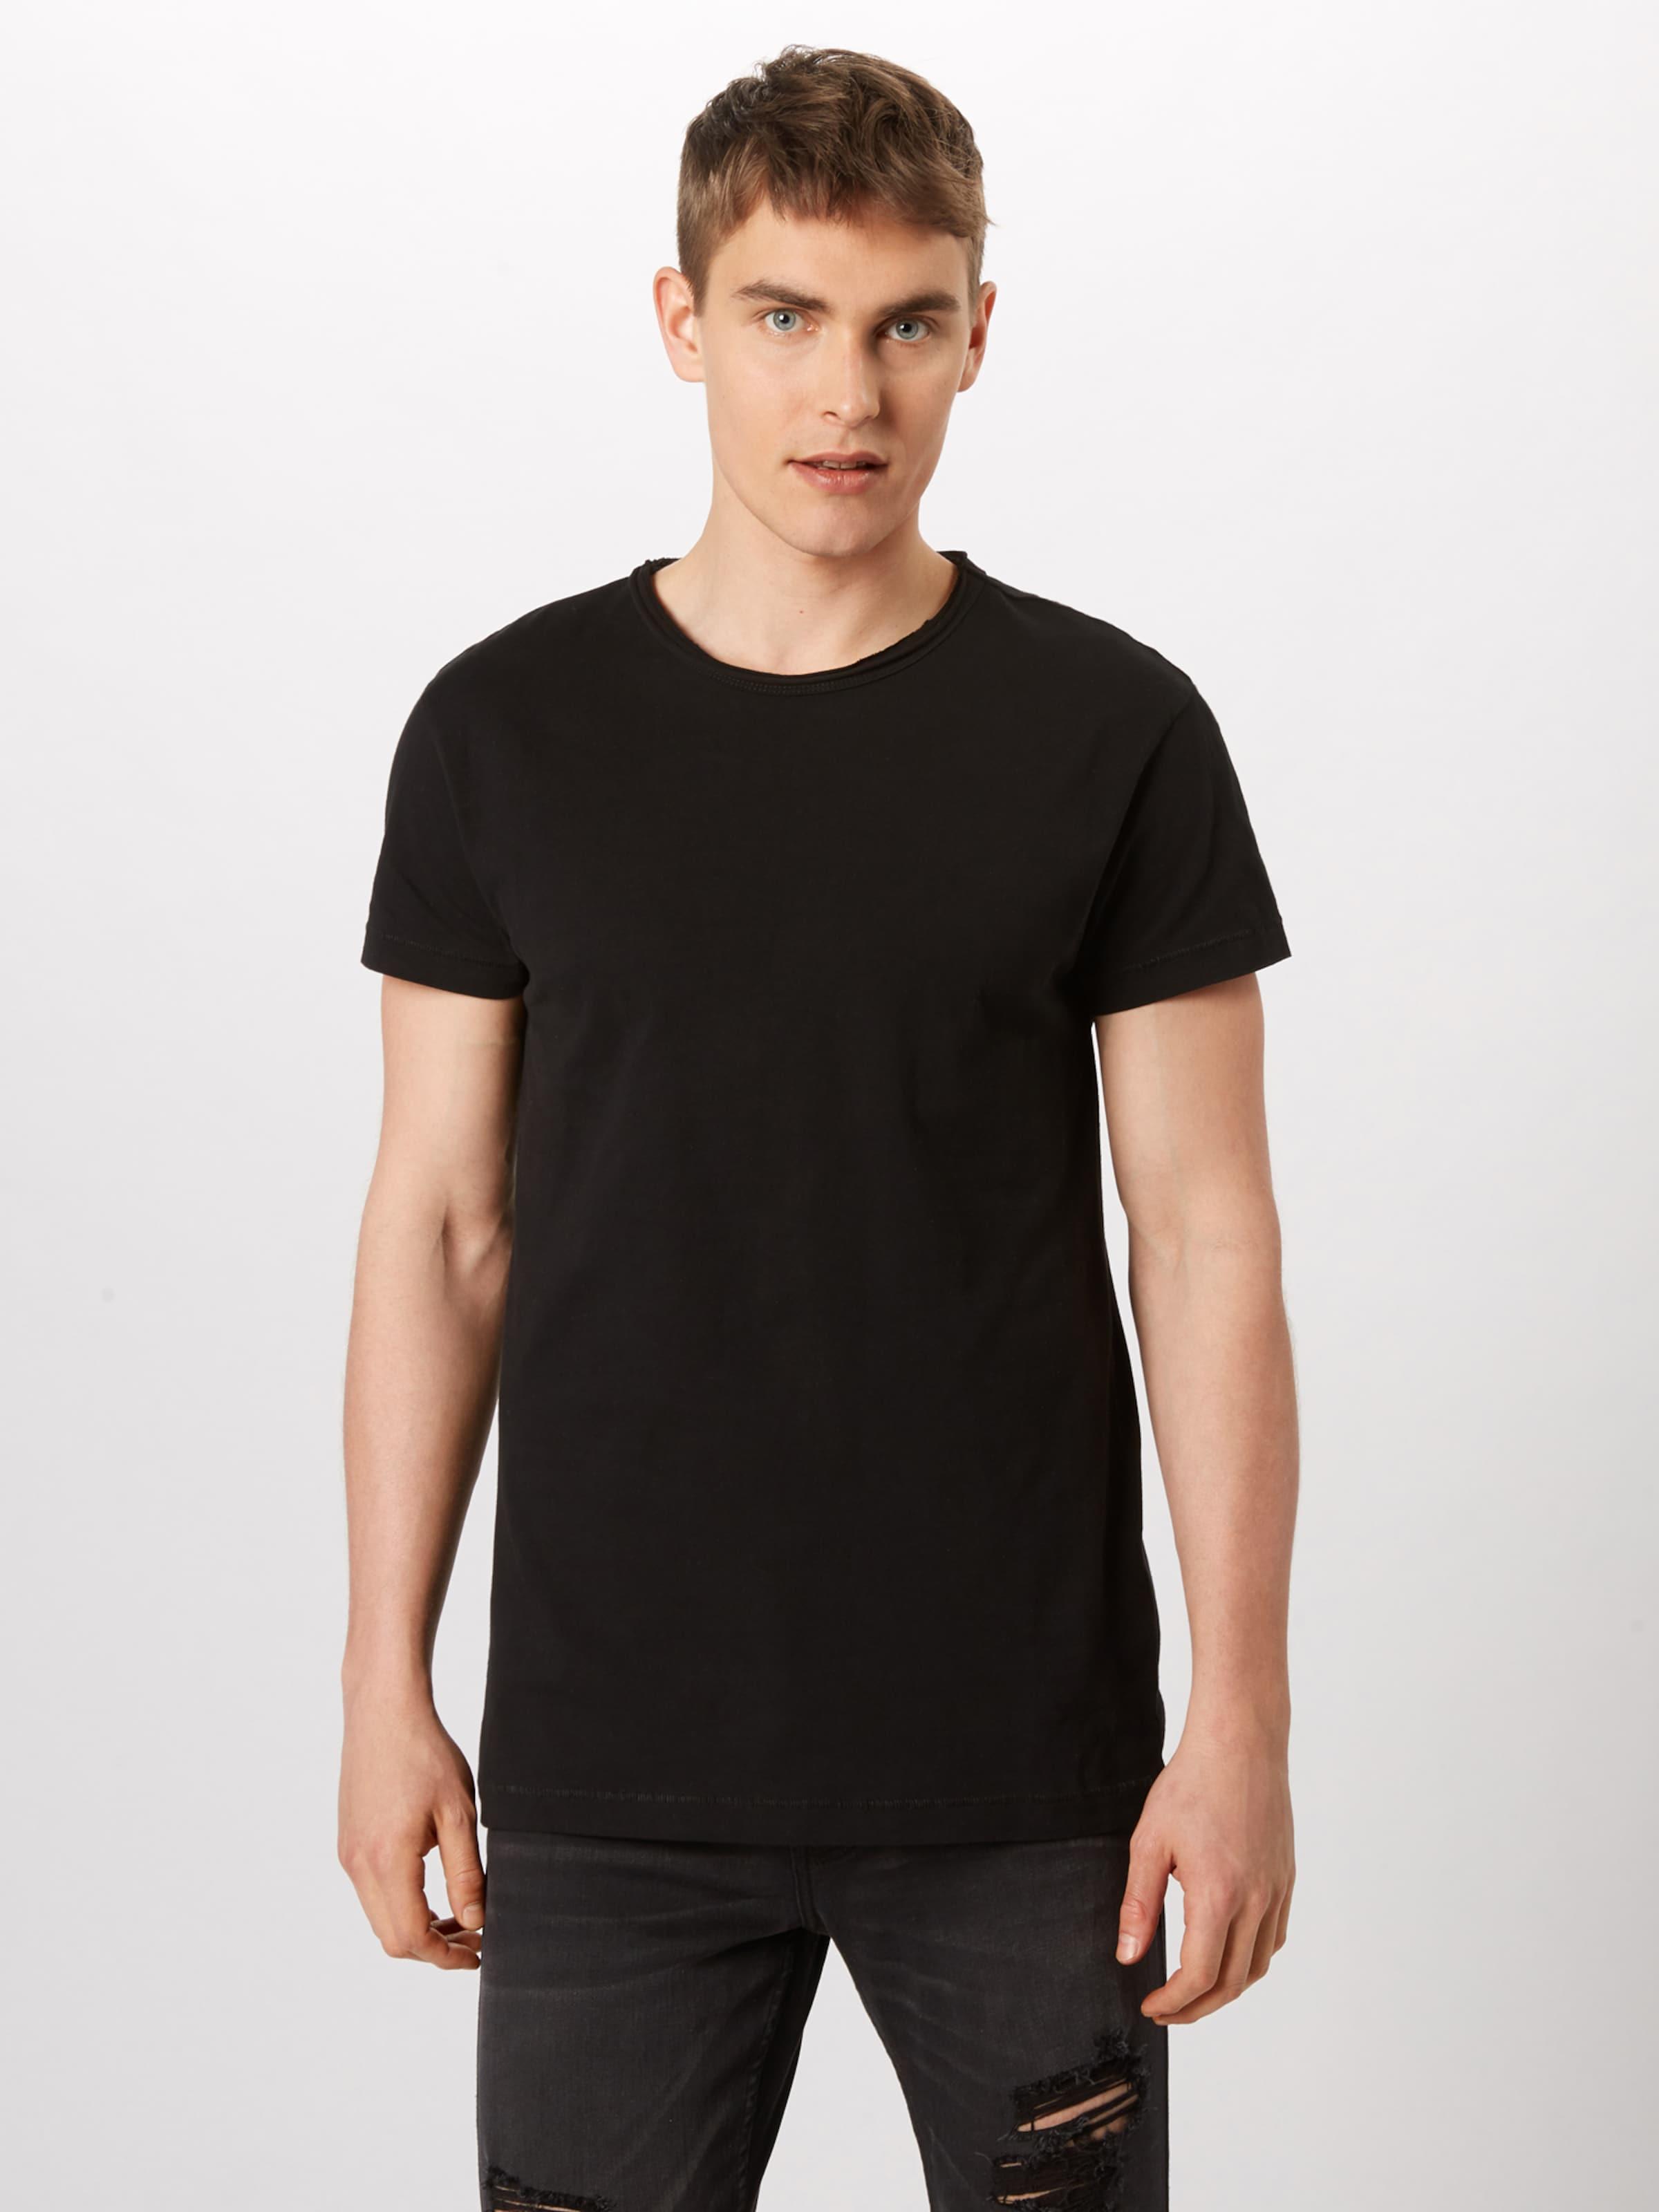 Classics In T Urban Schwarz shirt XikZOPTu